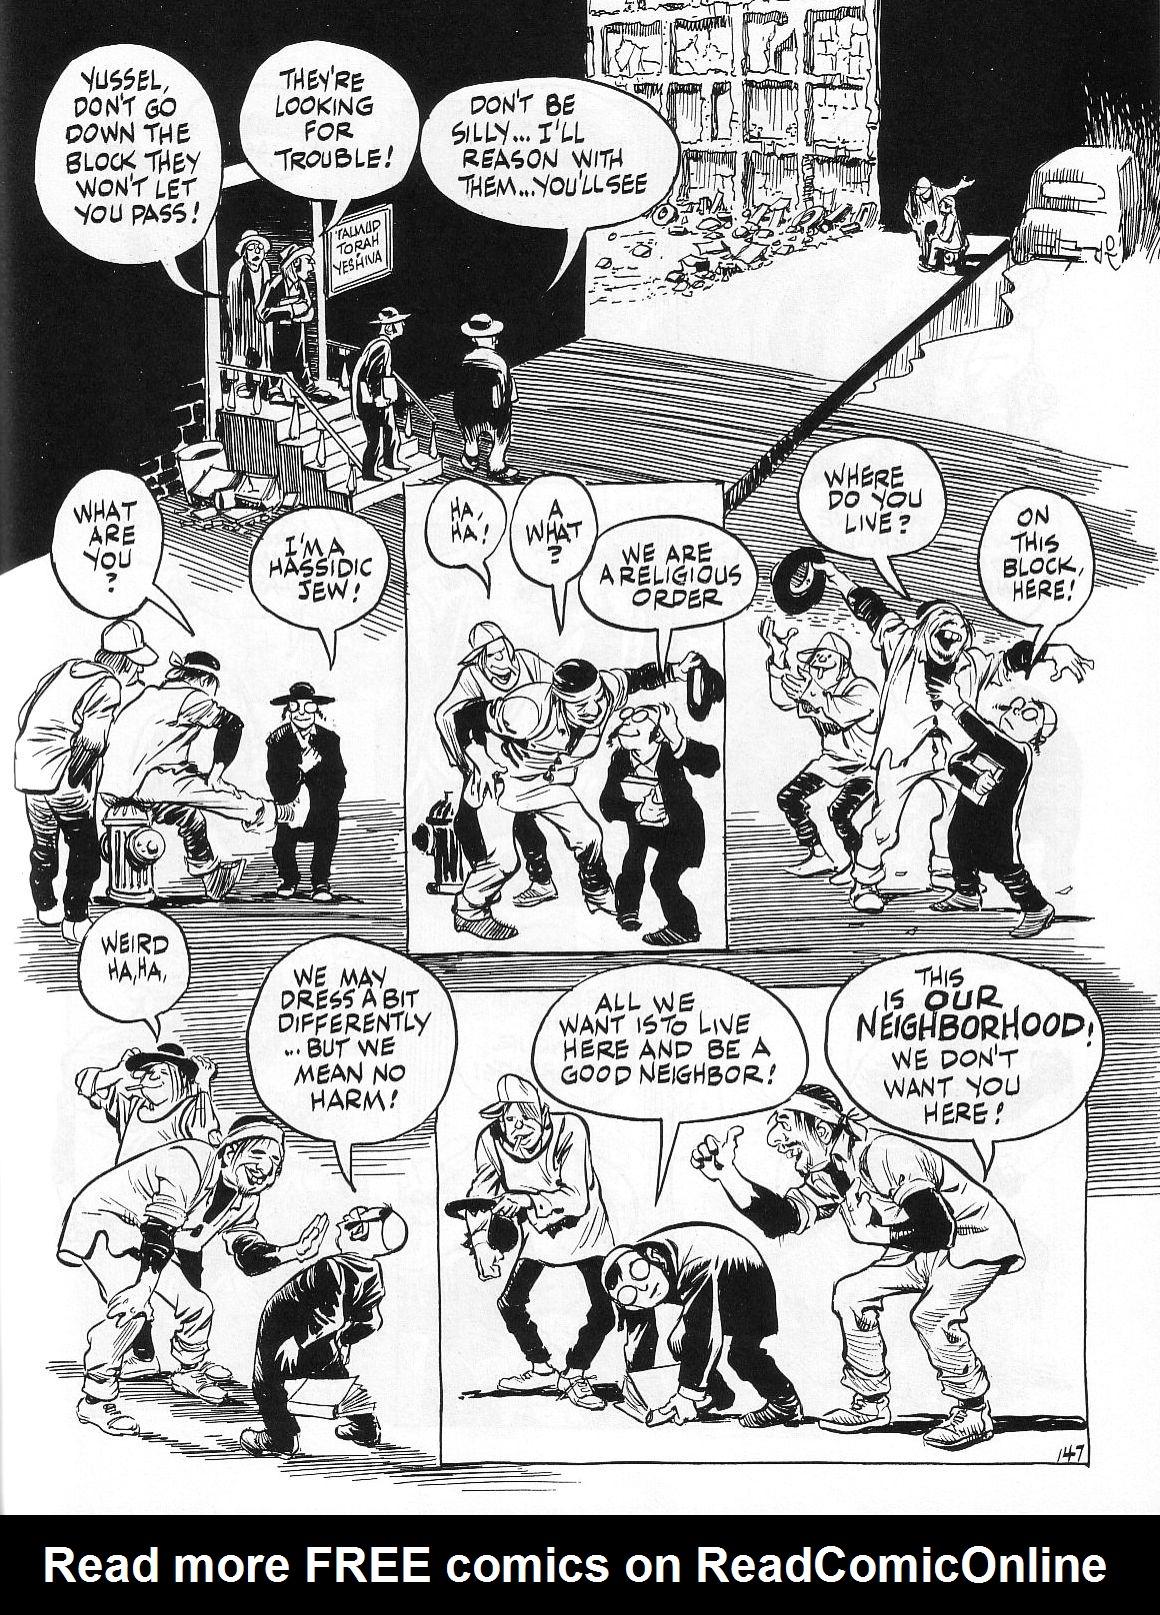 Read online Dropsie Avenue, The Neighborhood comic -  Issue # Full - 149